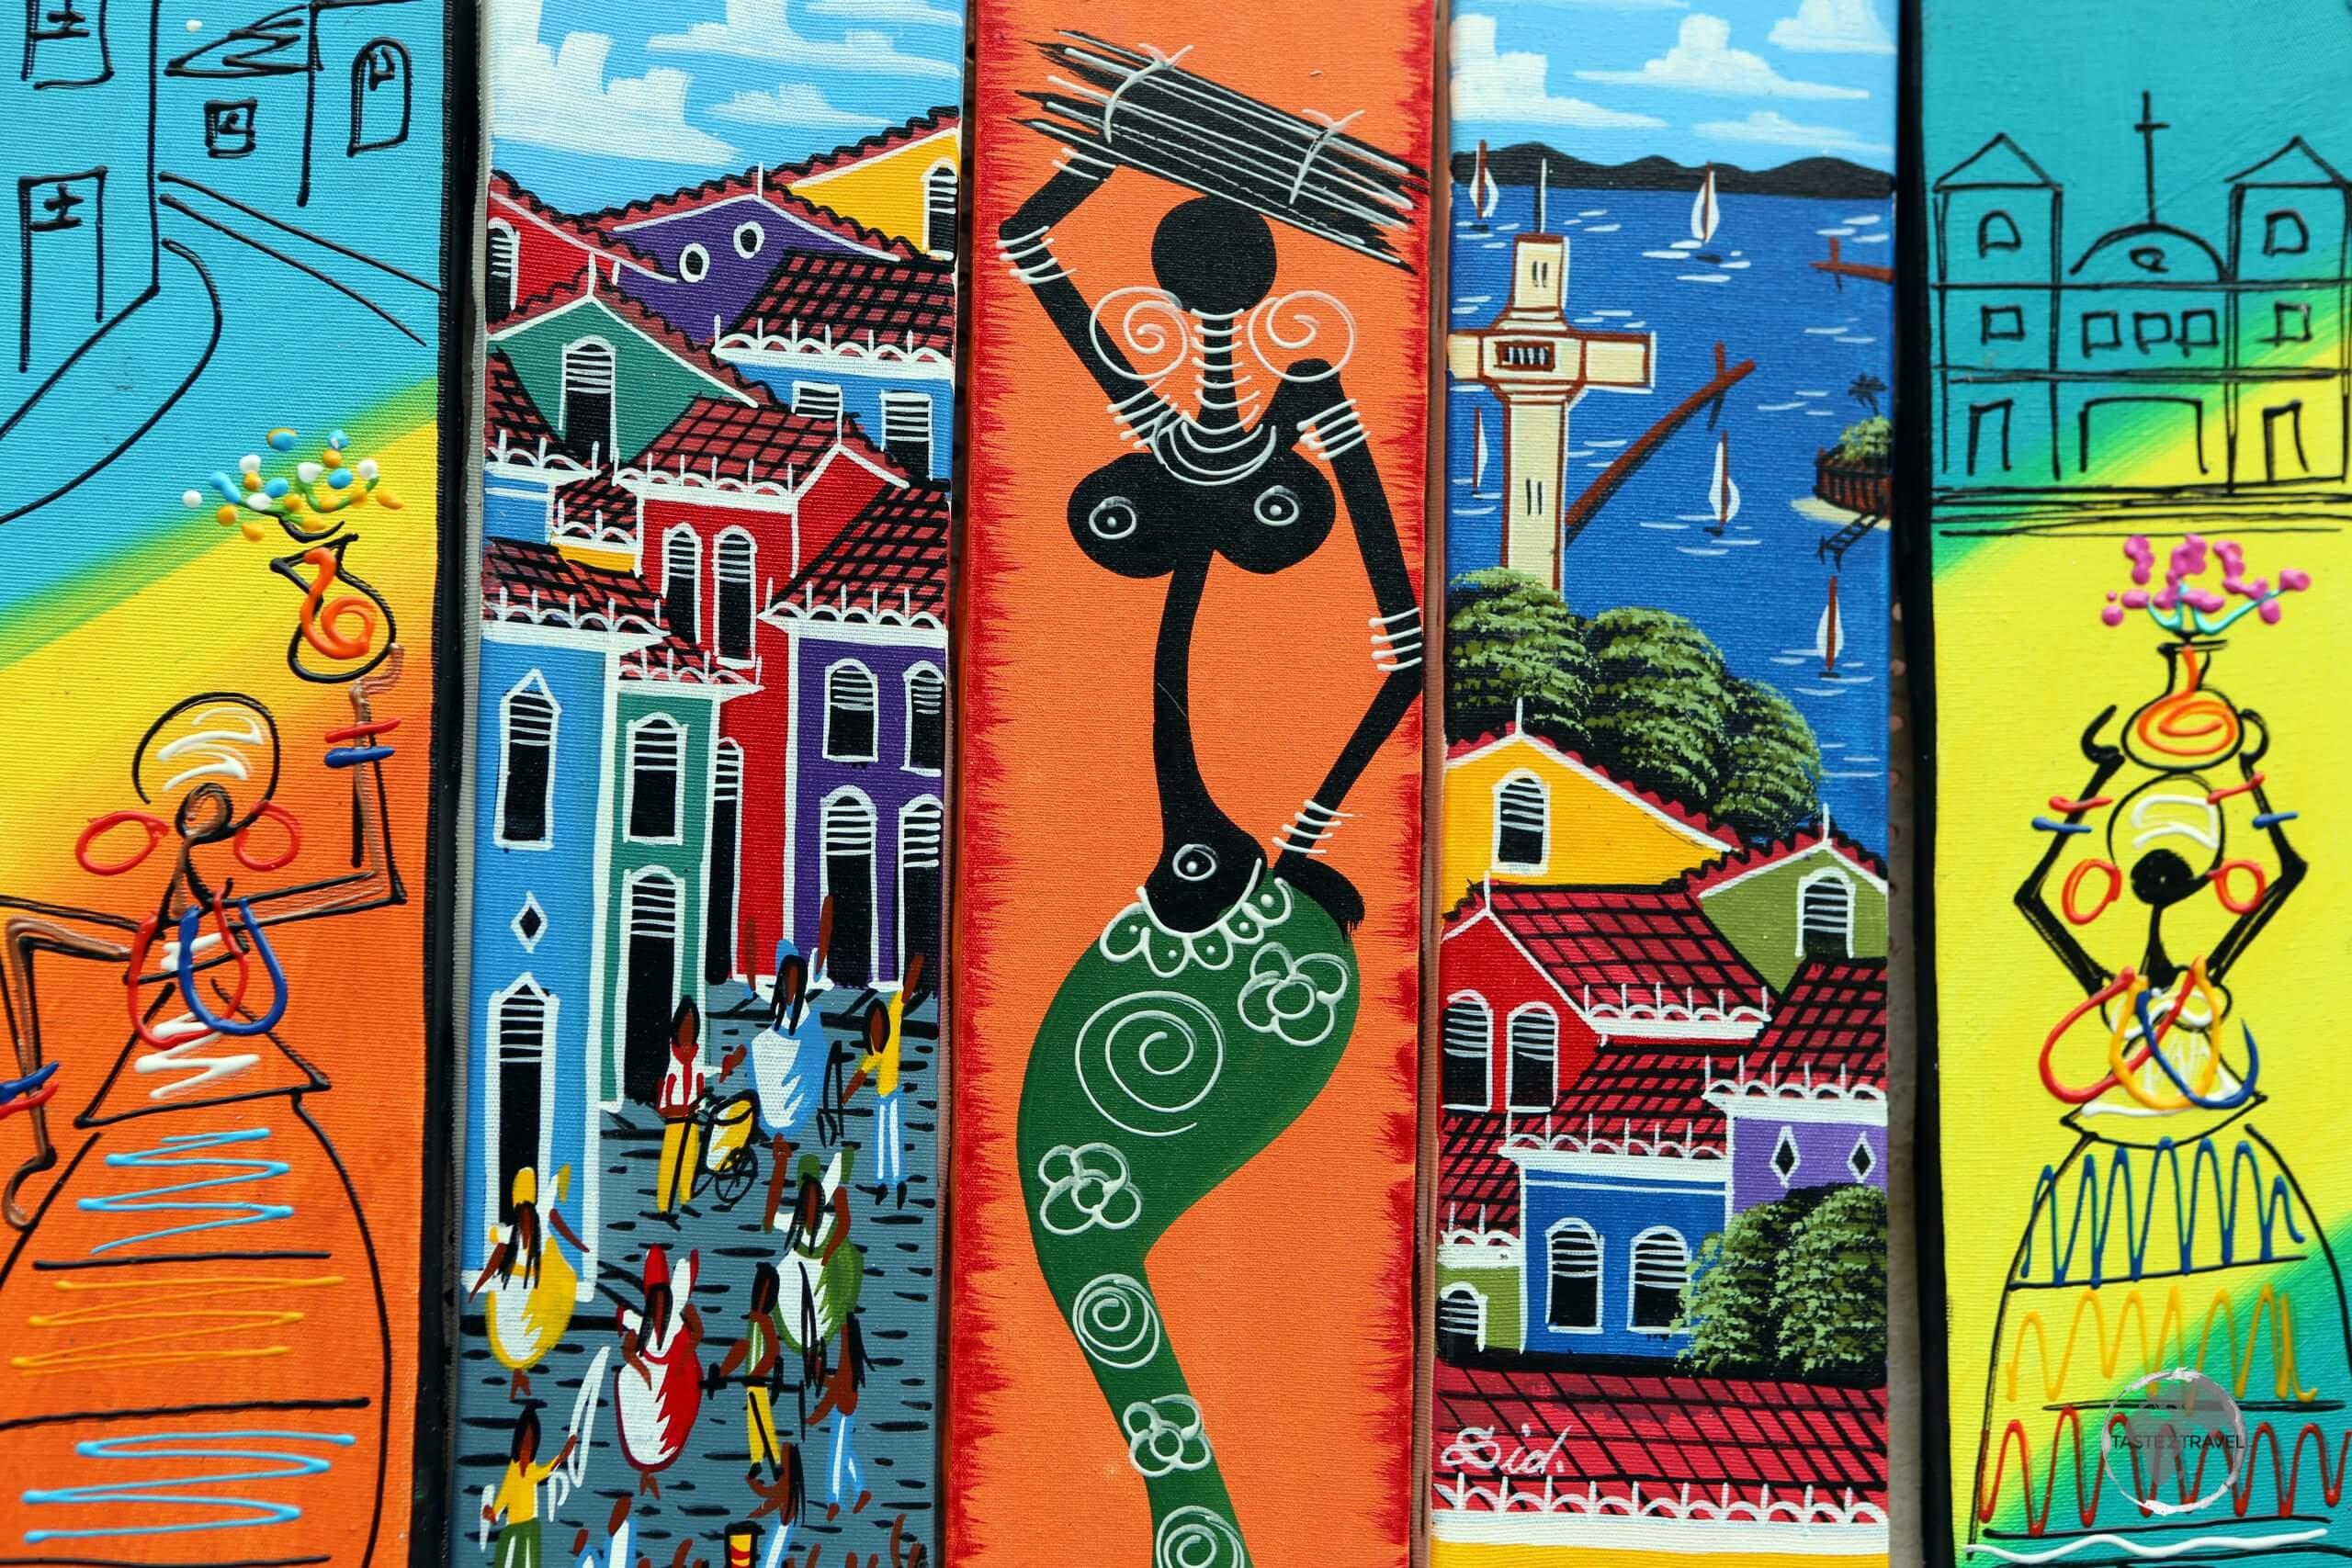 Colourful 'Afro-Brazilian' artwork in Salvador, an important Brazilian cultural centre.